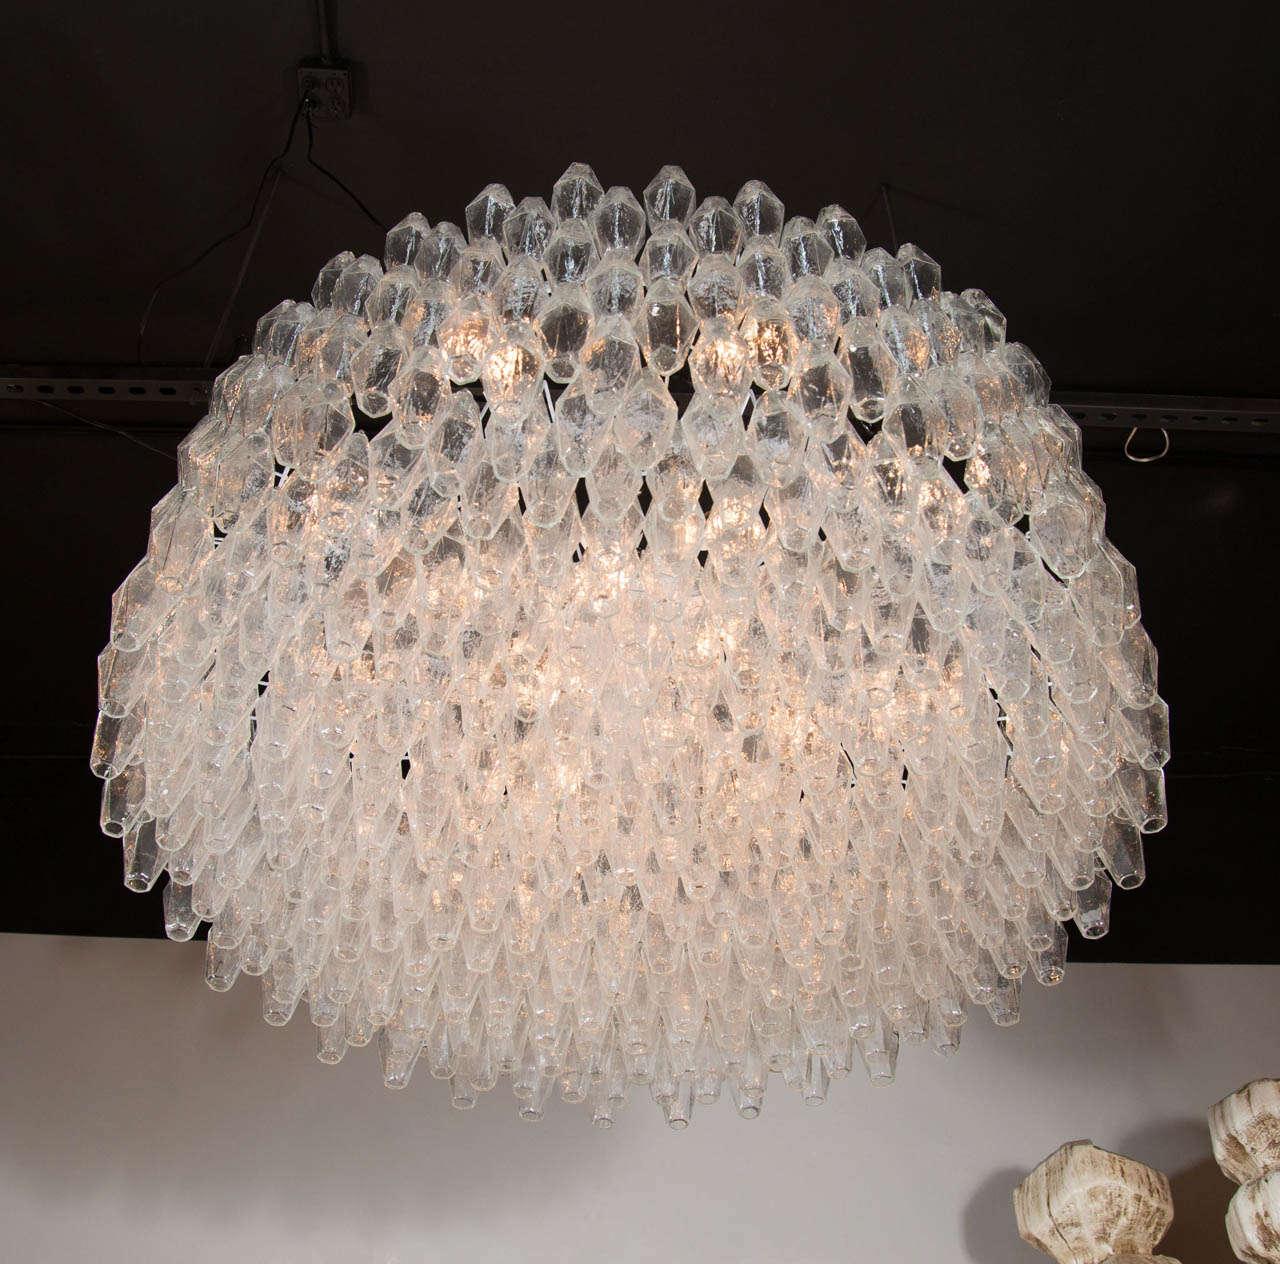 Monumental Handblown Smoked Murano Glass Polyhedral Chandelier by Venini 5